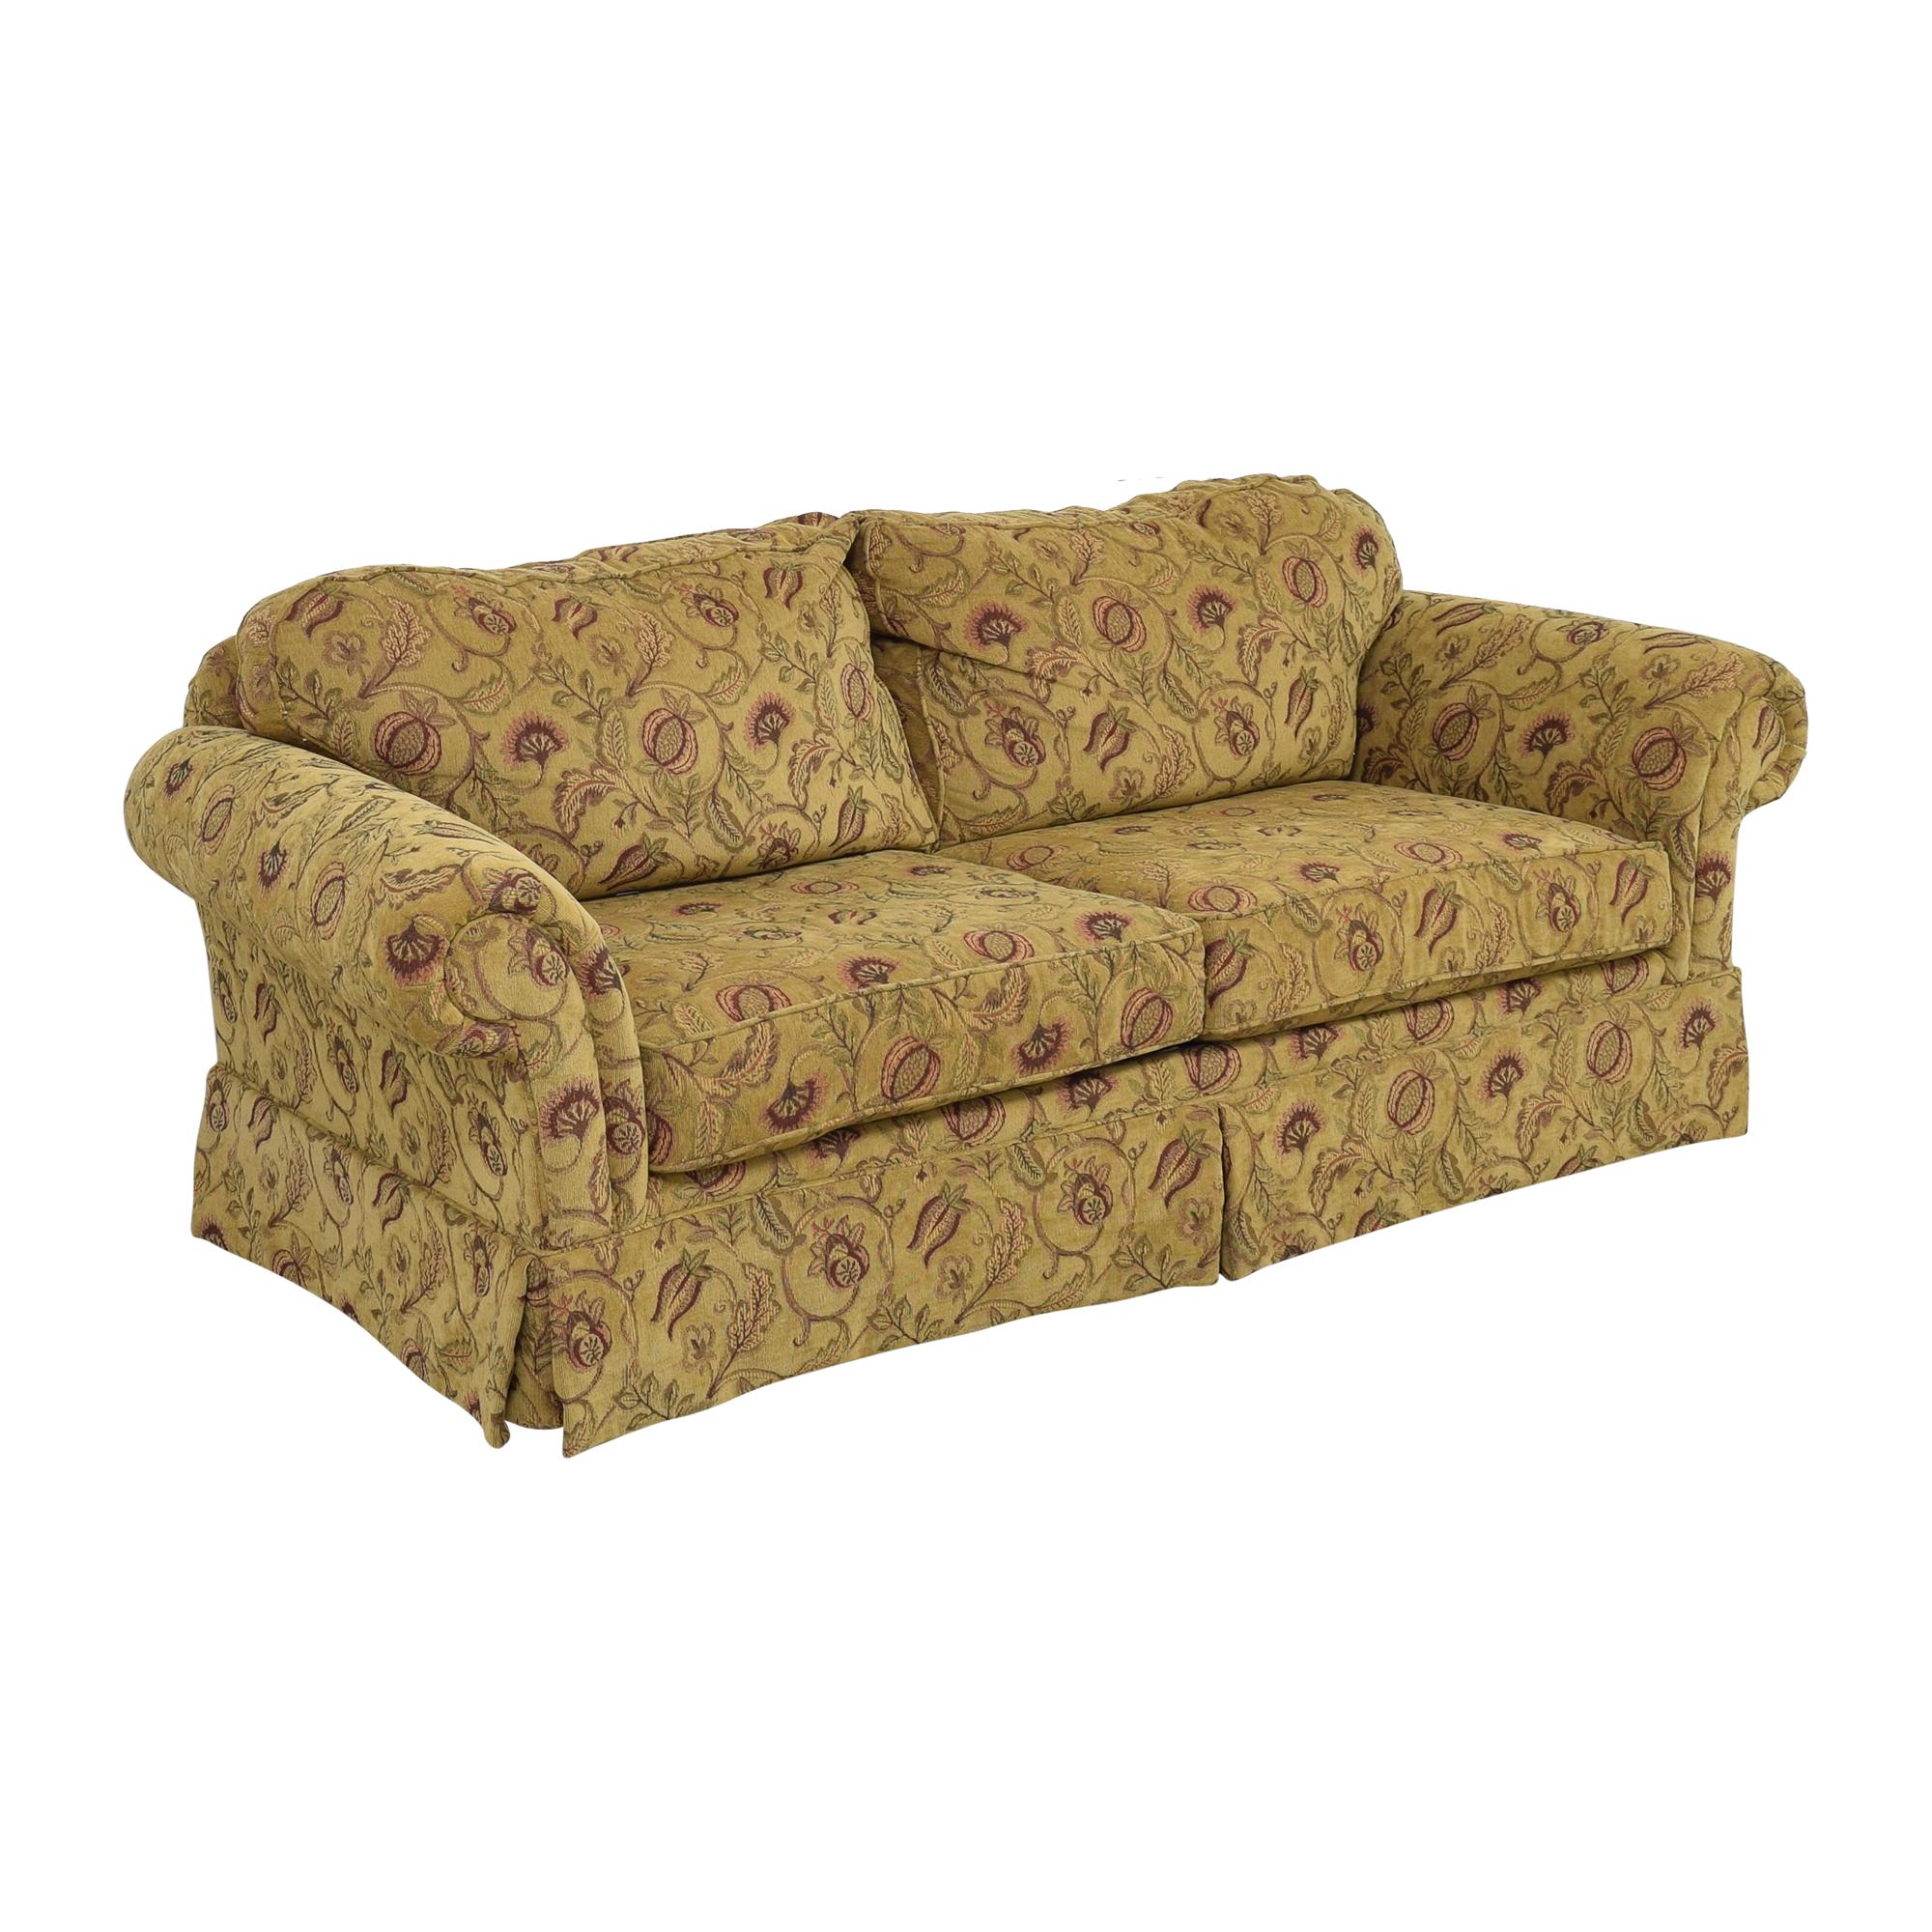 Broyhill Furniture Broyhill Furniture Two Cushion Skirted Sofa on sale